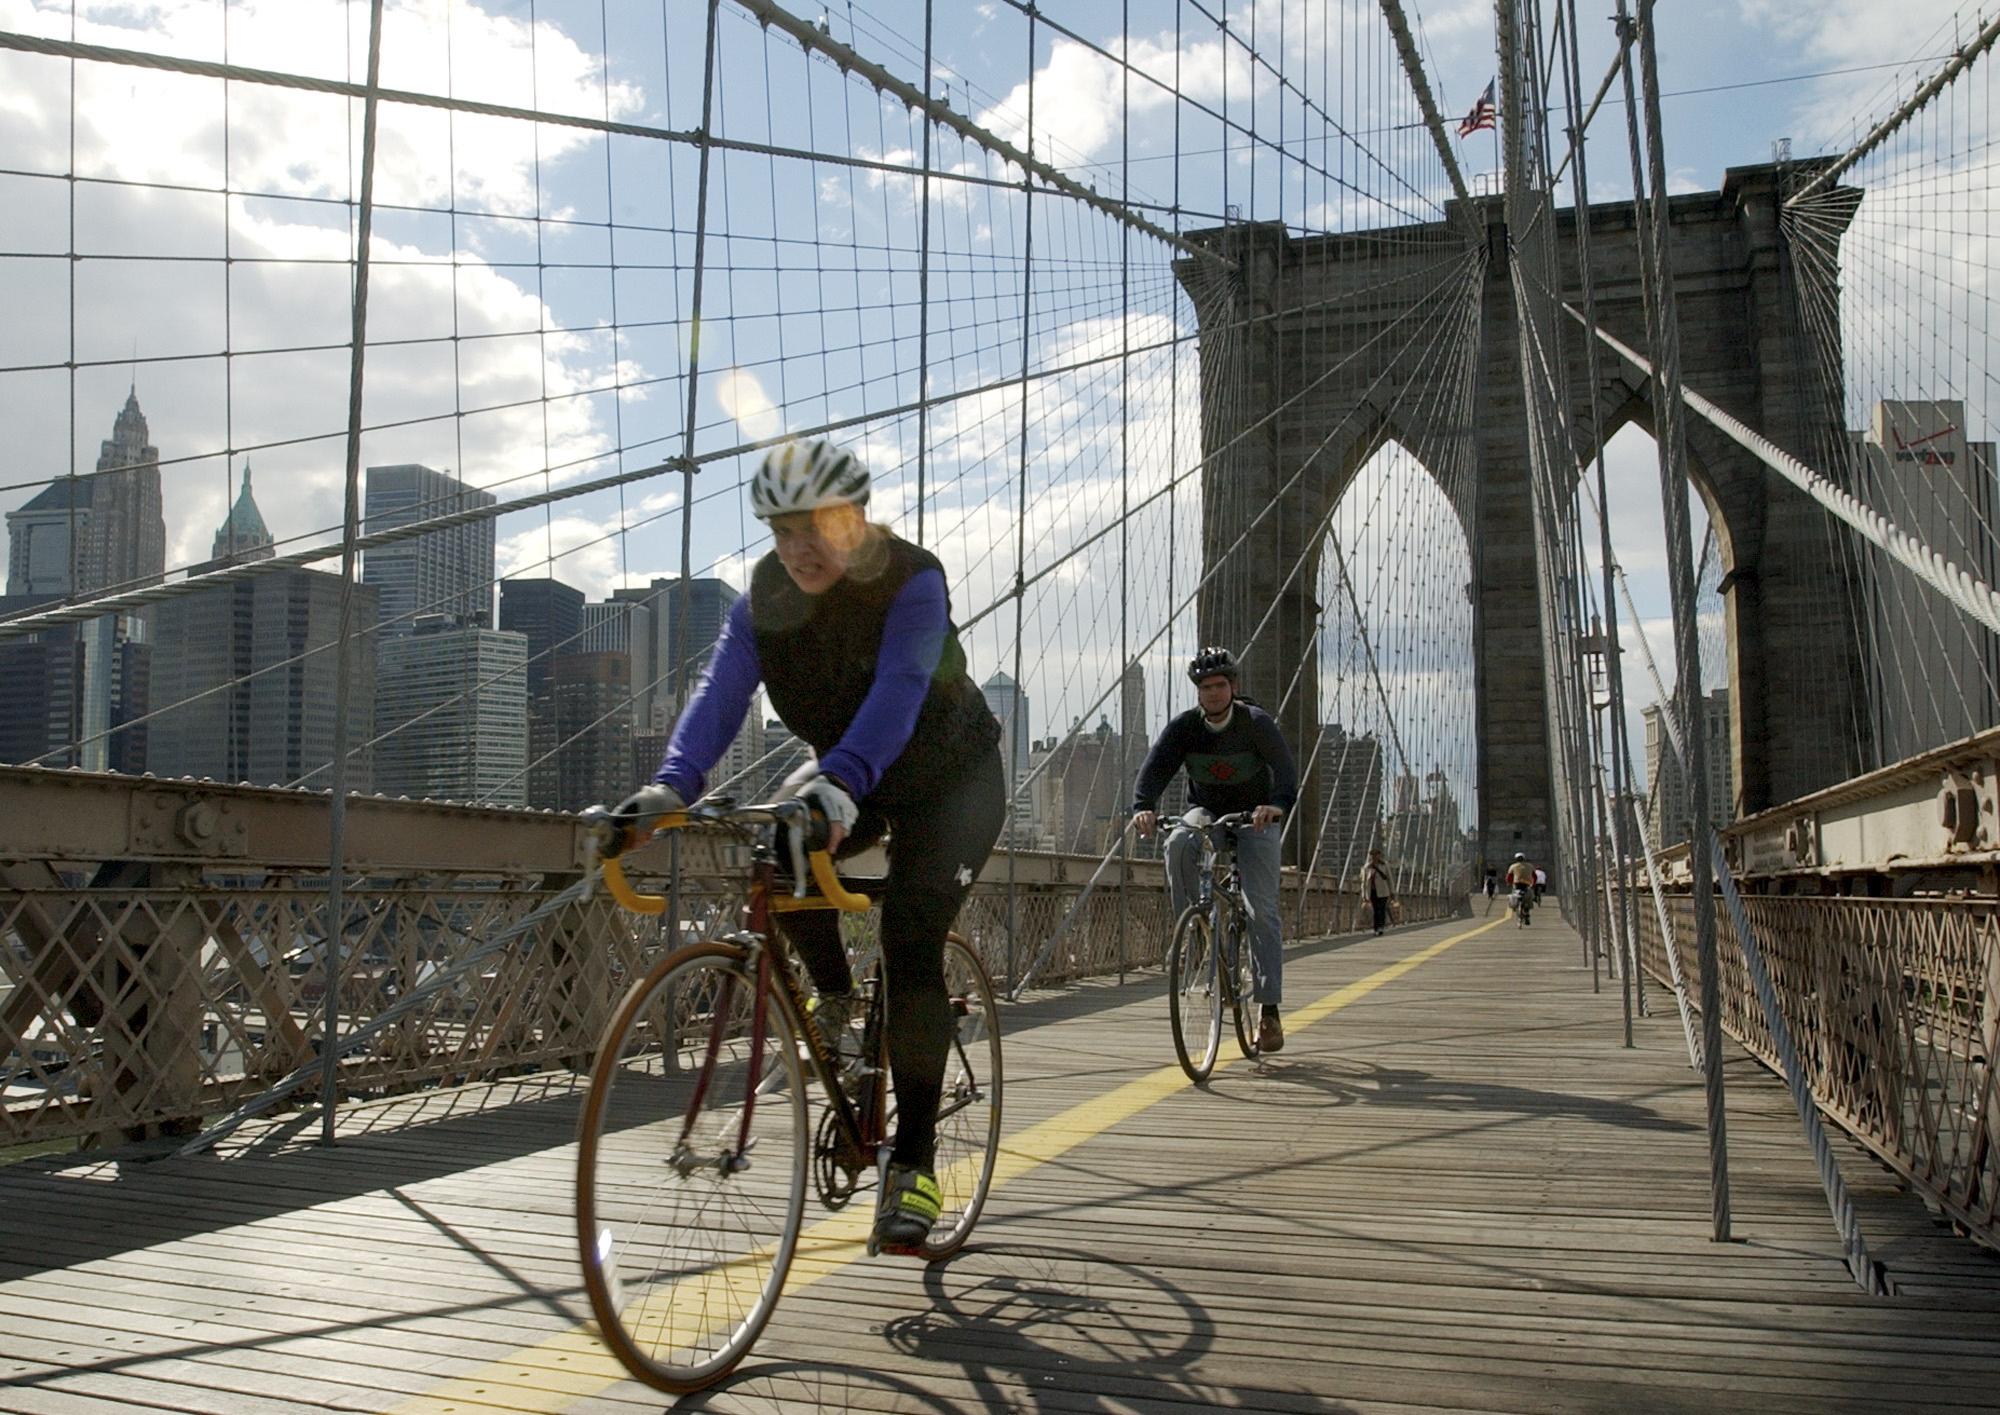 NYC Bridges-Bicycle Lanes